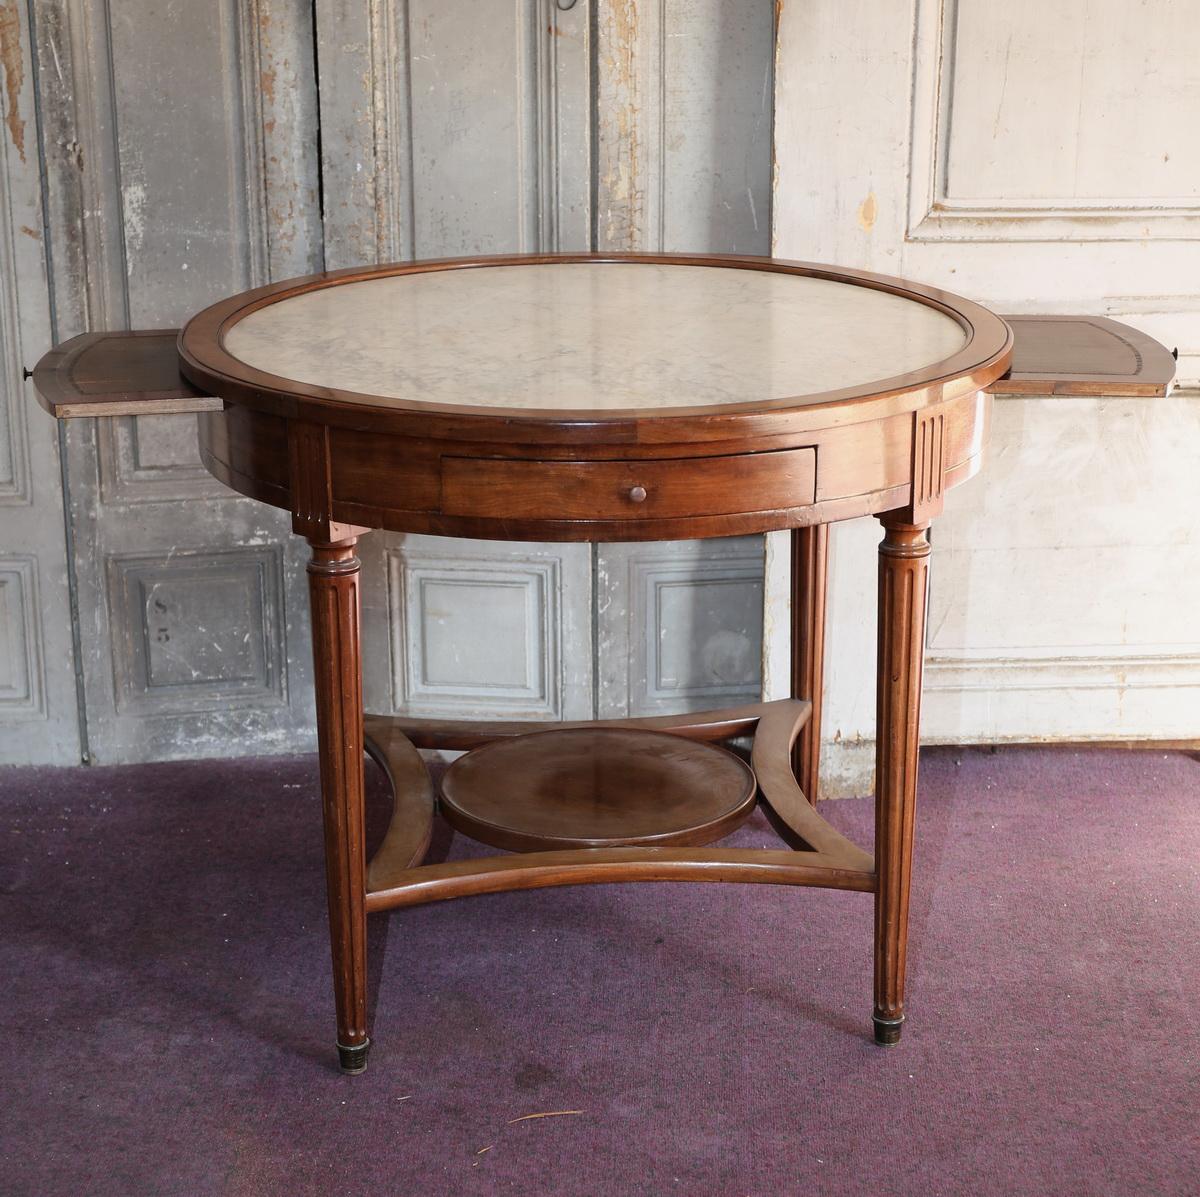 Table bouillotte style Louis XVI fin XIXème